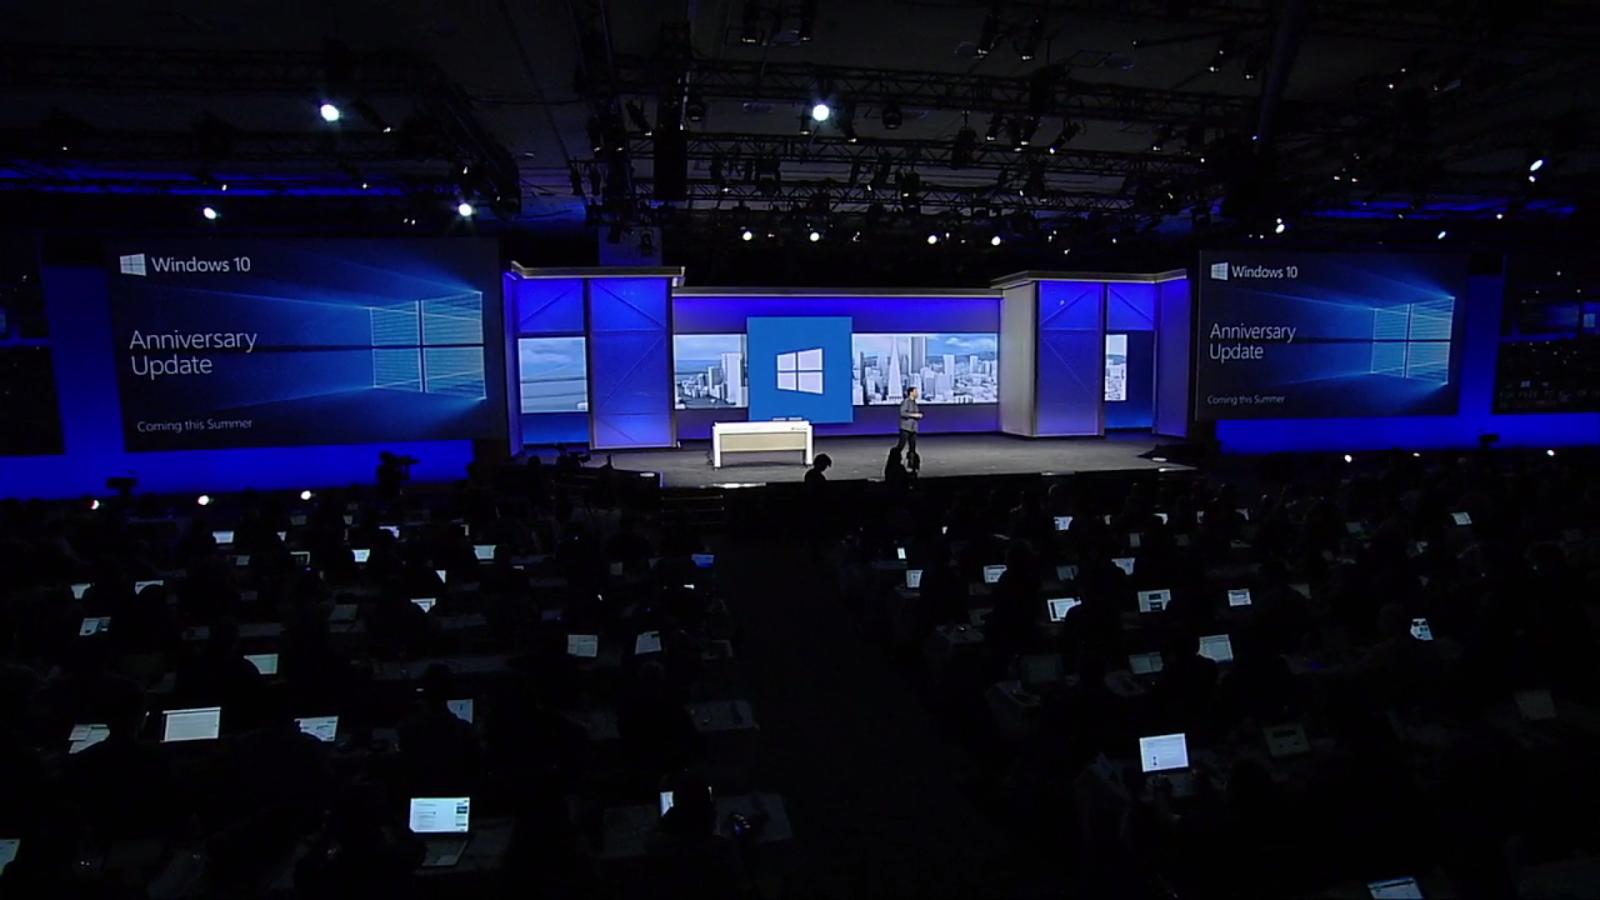 #Windows10 #AnniversaryUpdate - #DayOne - http://bit.ly/2aOeizJ via @HTNOVO  #Microsoft